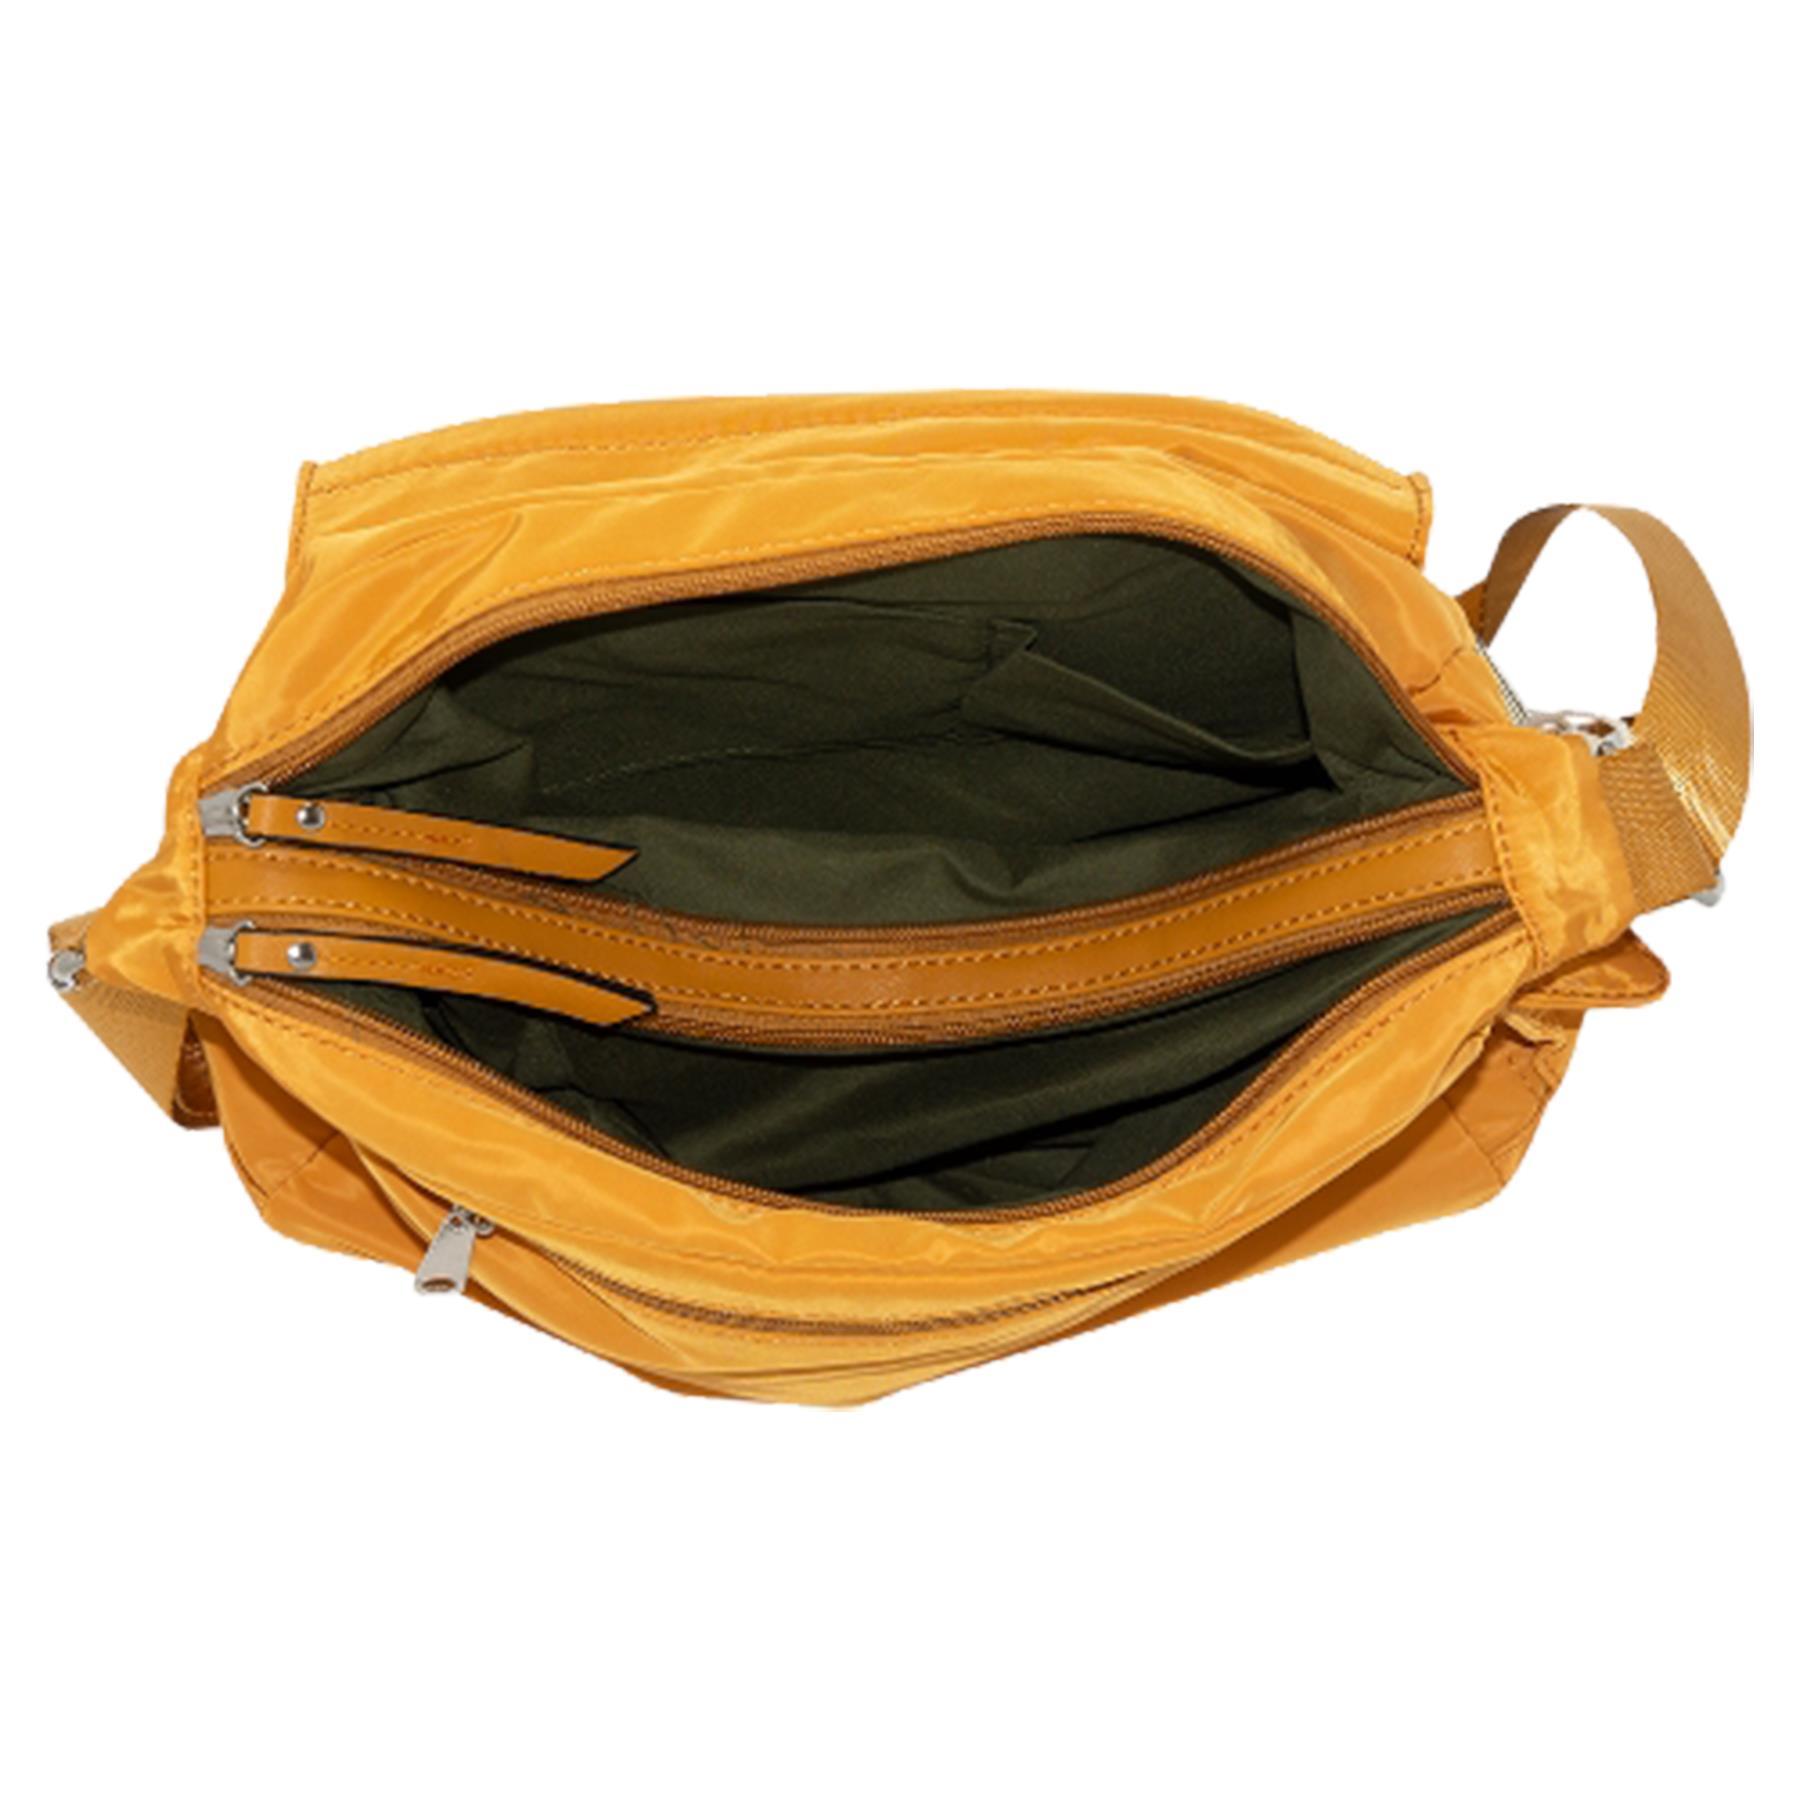 New-Ladies-Men-s-Showerproof-School-College-Practical-Basic-Crossbody-Bag thumbnail 50